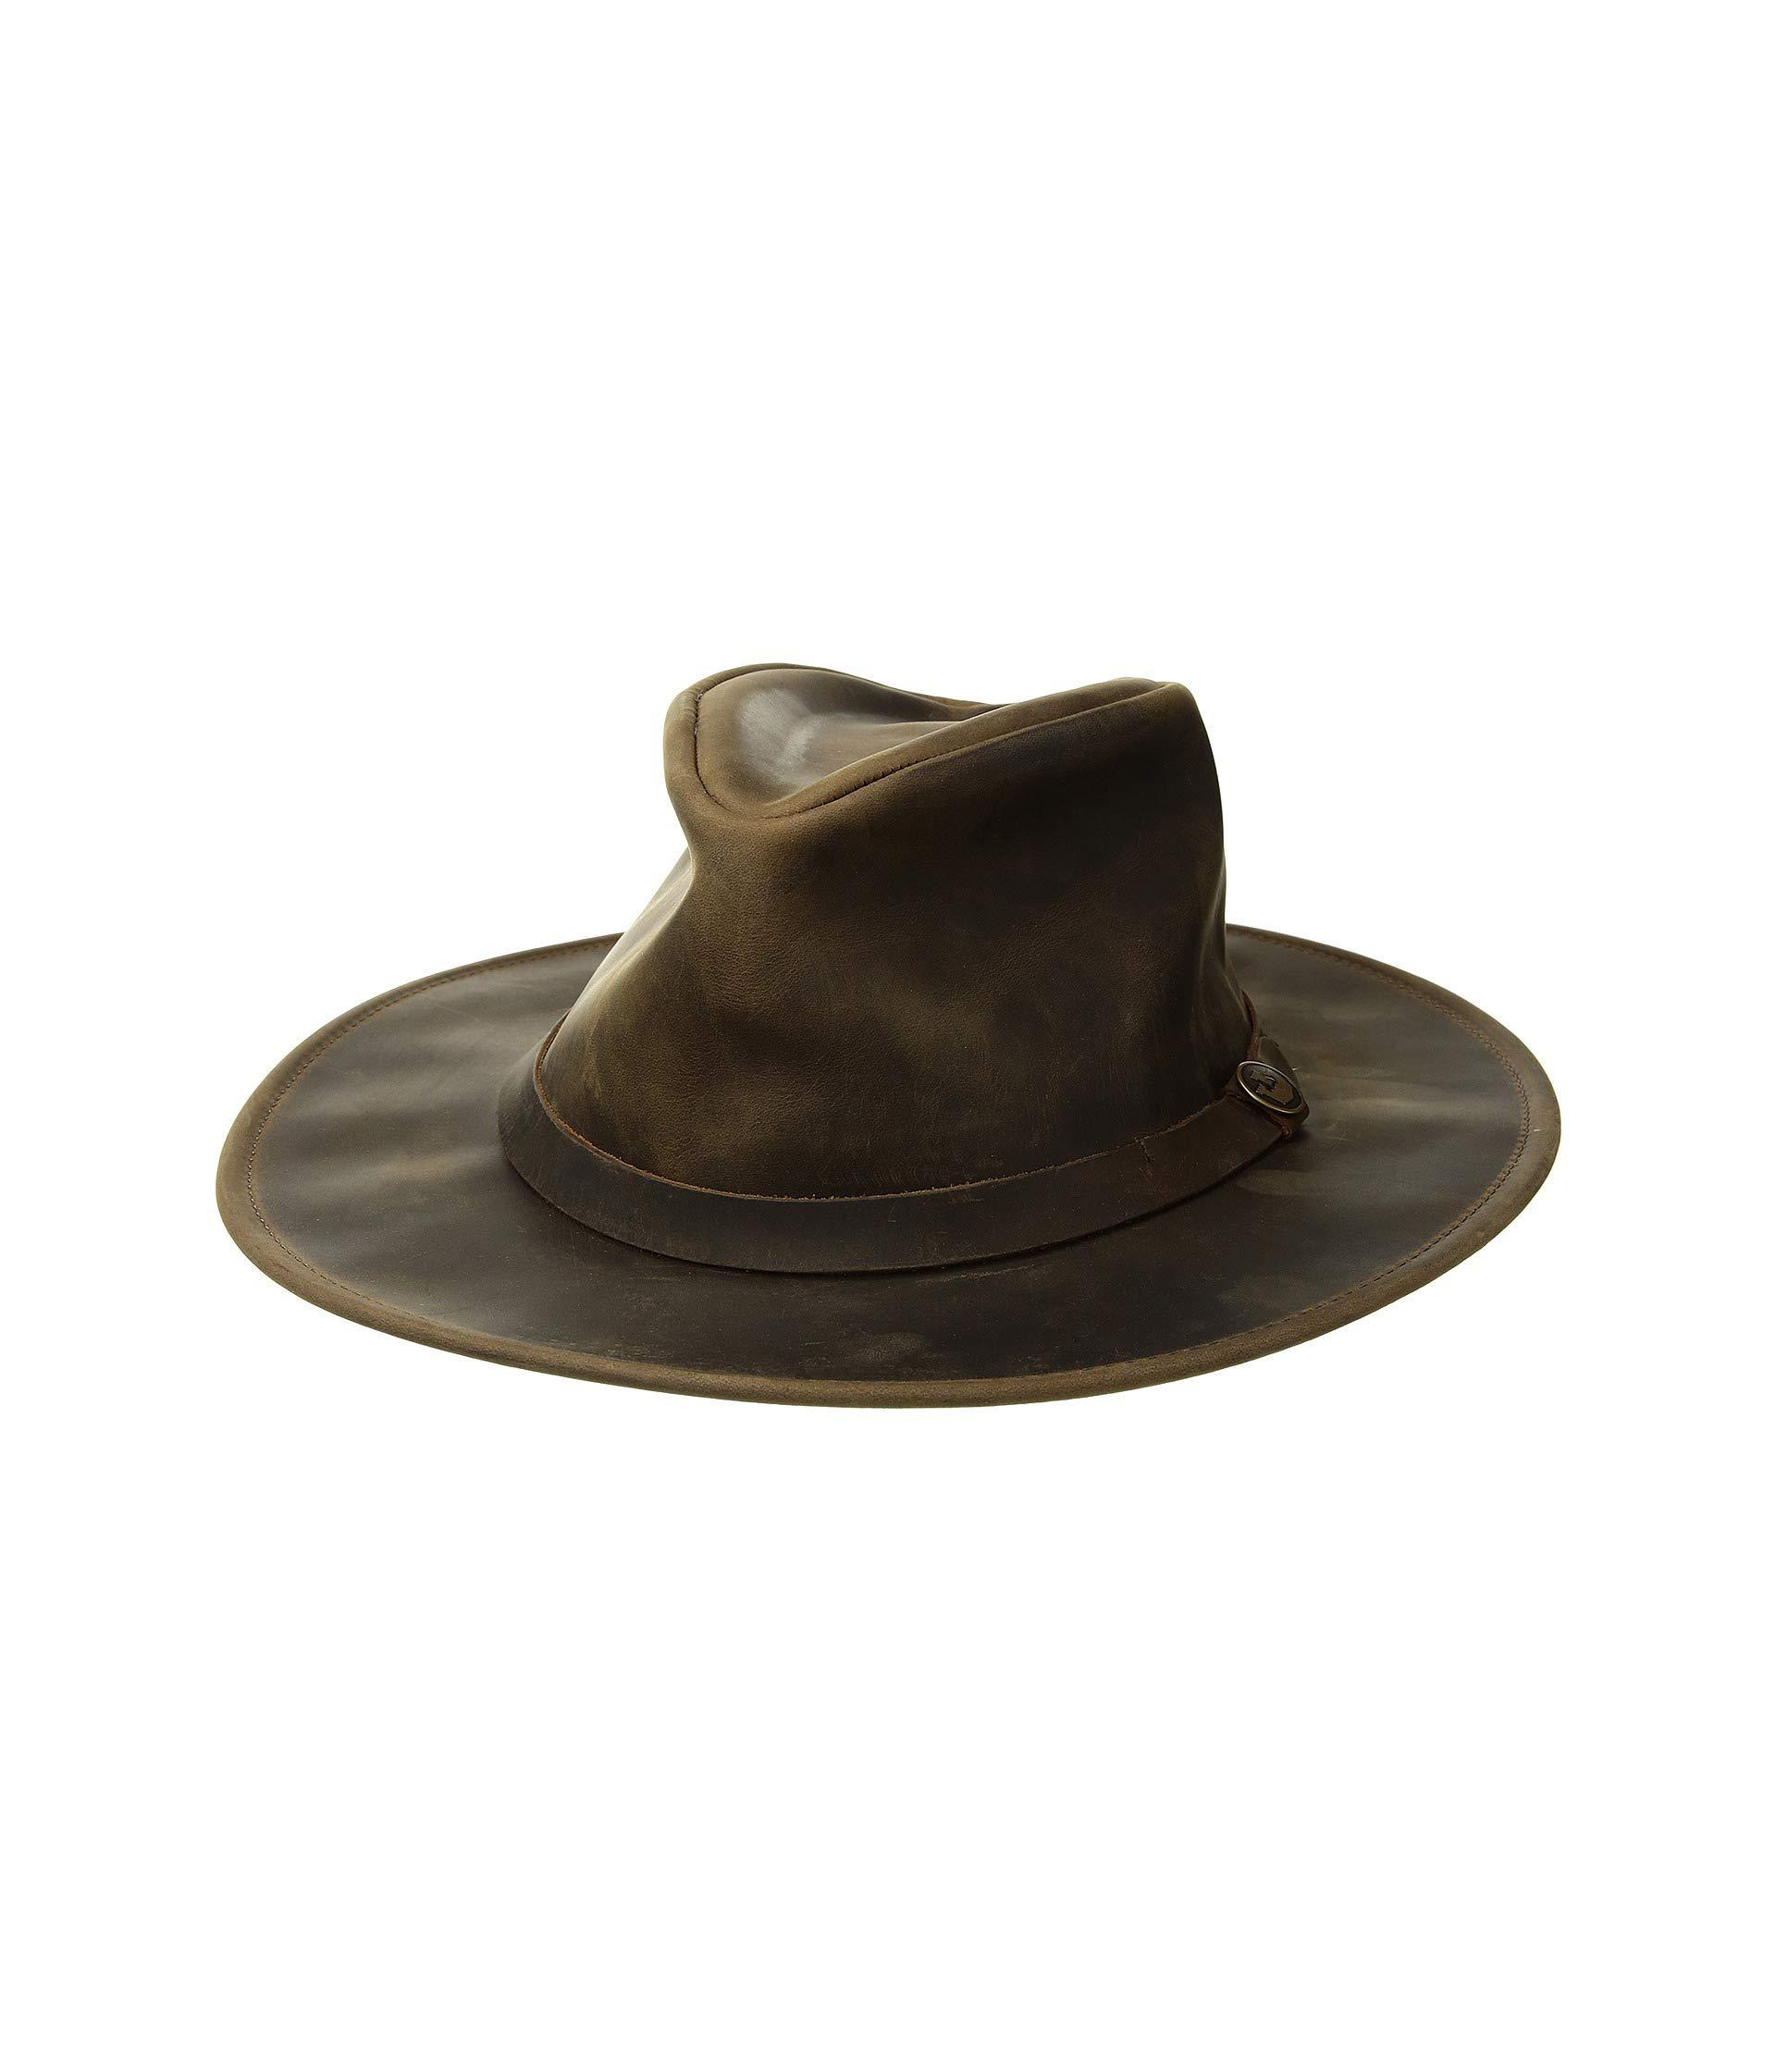 c4e49daf0bac3 Goorin Bros North Fork (brown) Caps in Brown for Men - Lyst